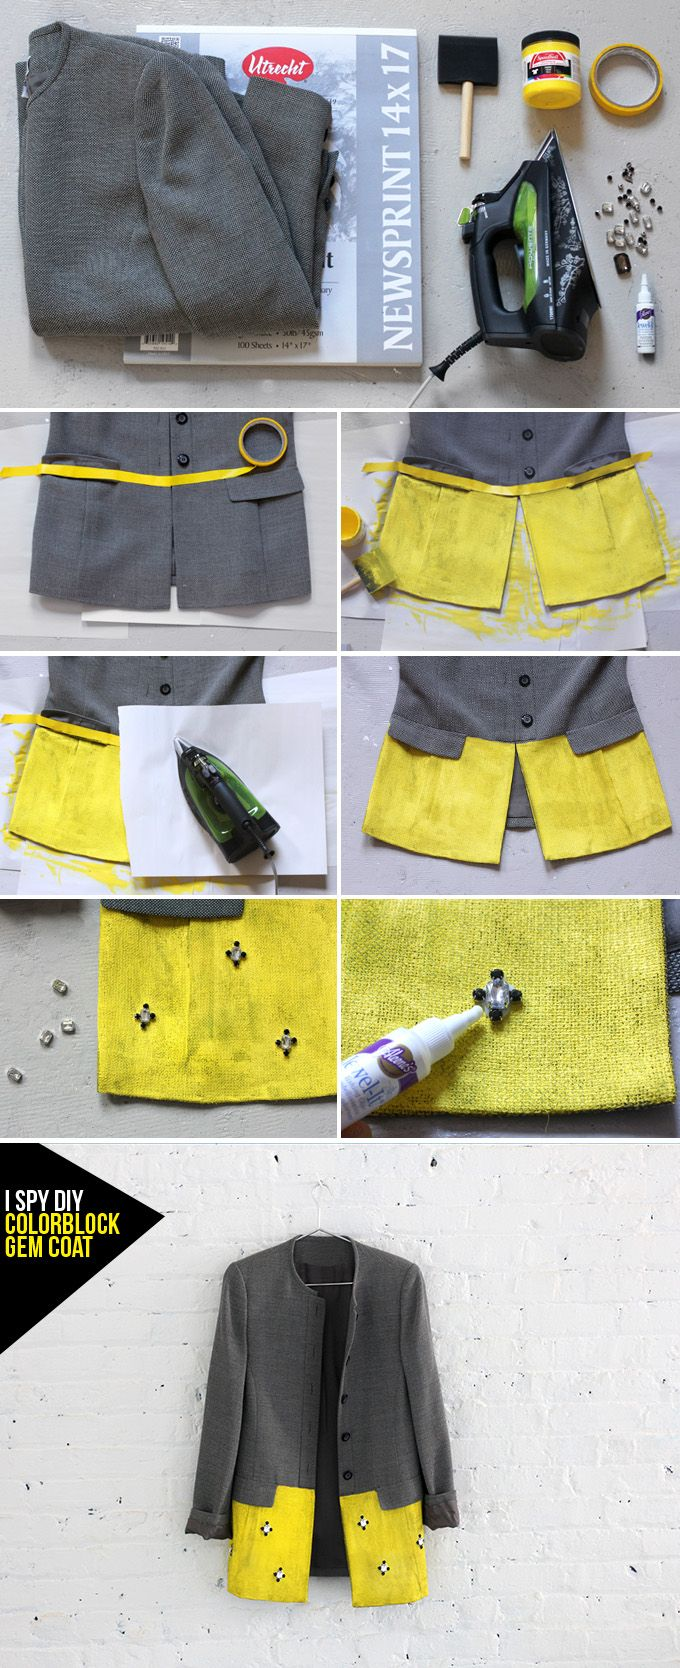 STEPS    Colorblock Gem Coats